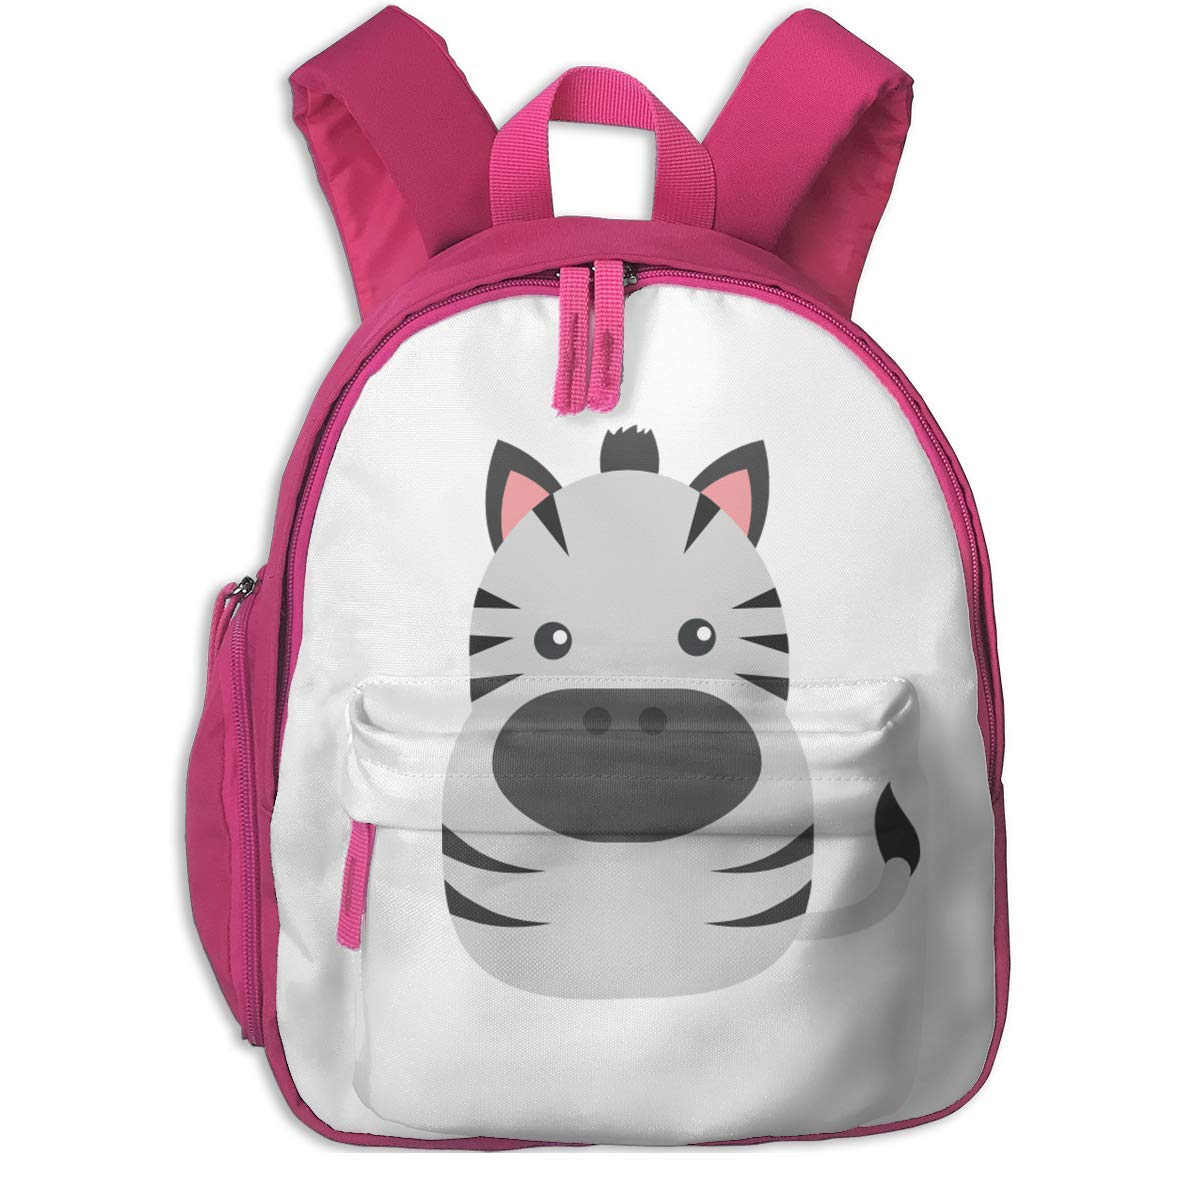 4ebcd1008c School Backpack for Girls Boys, Kids Cute schwarz and Weiß Pig Cartoon  Backpacks Book Bag